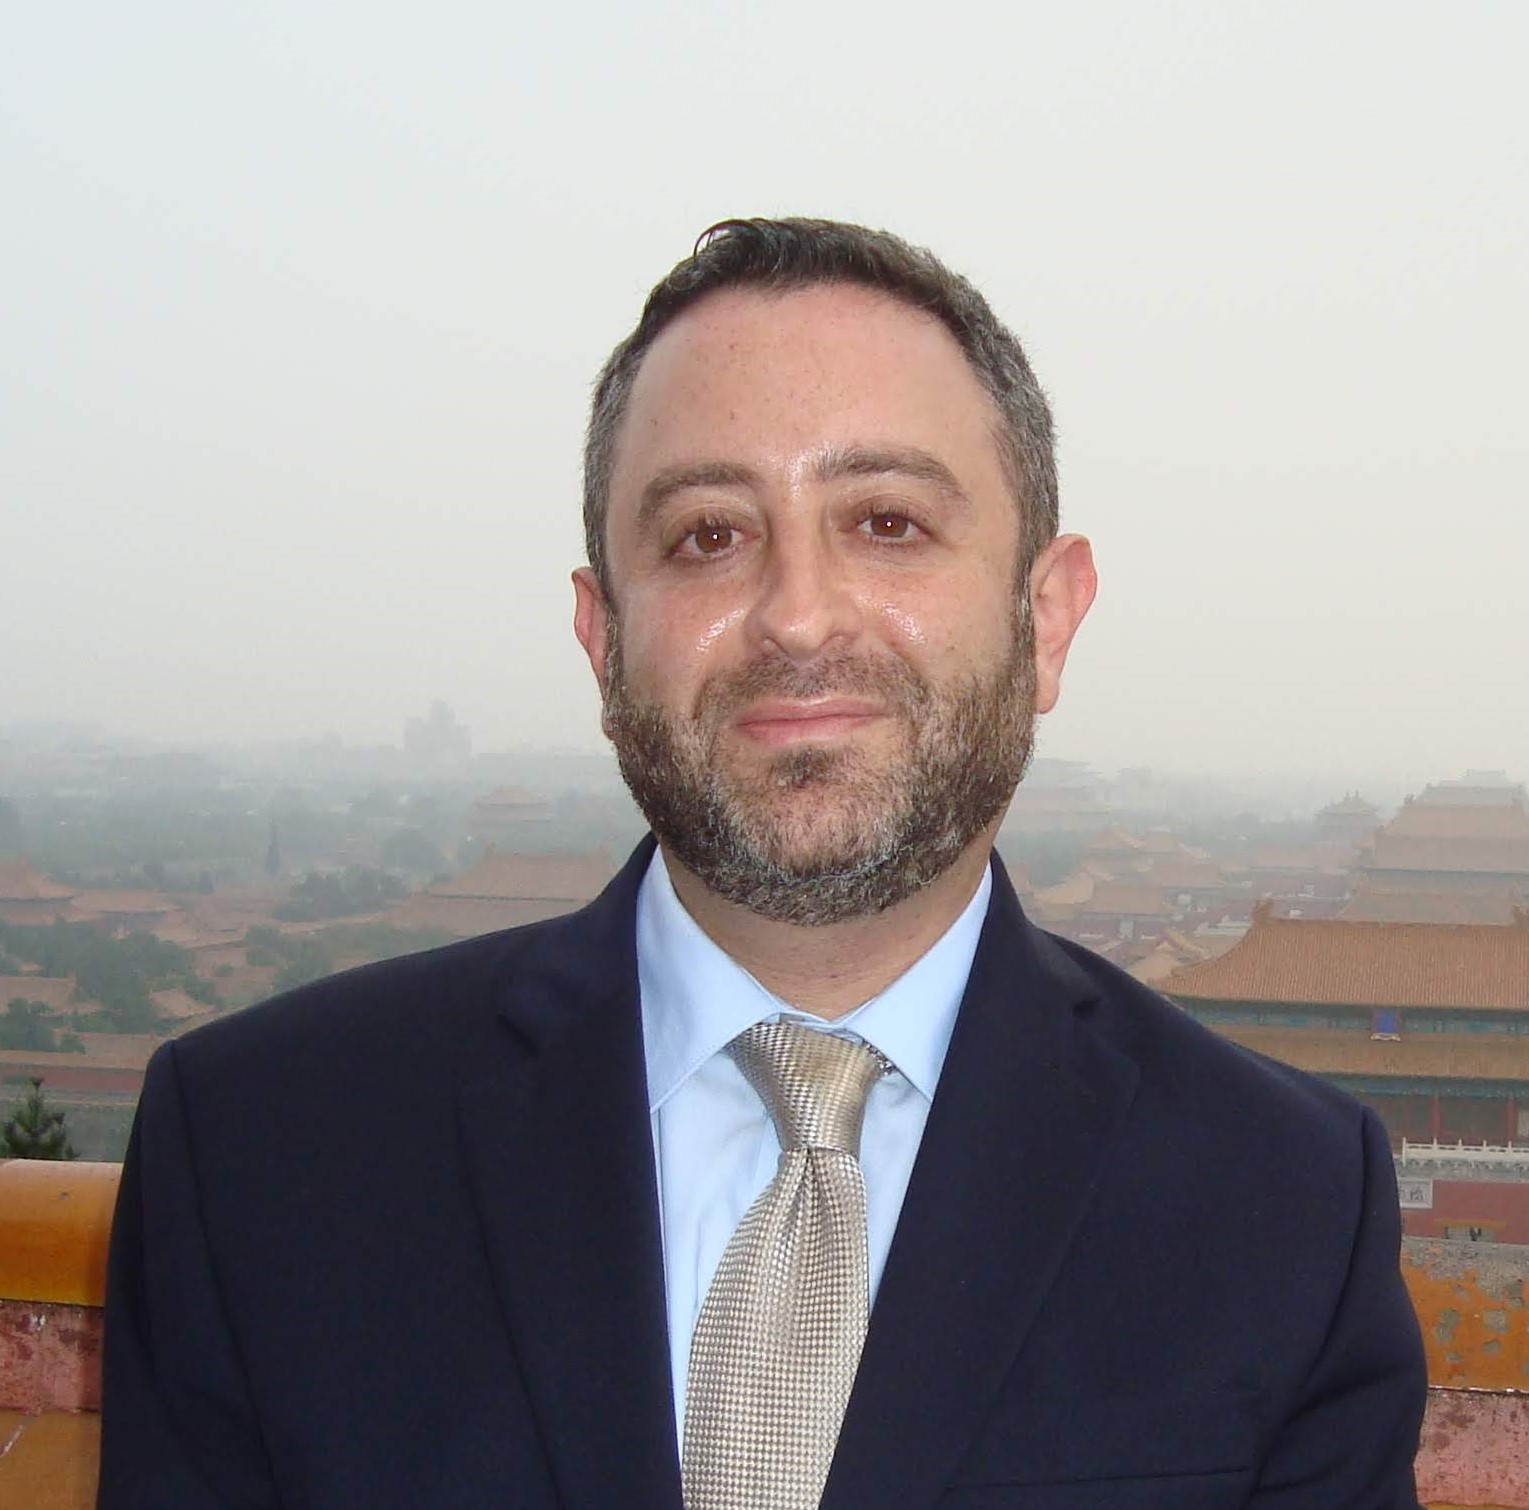 Samuel Spector